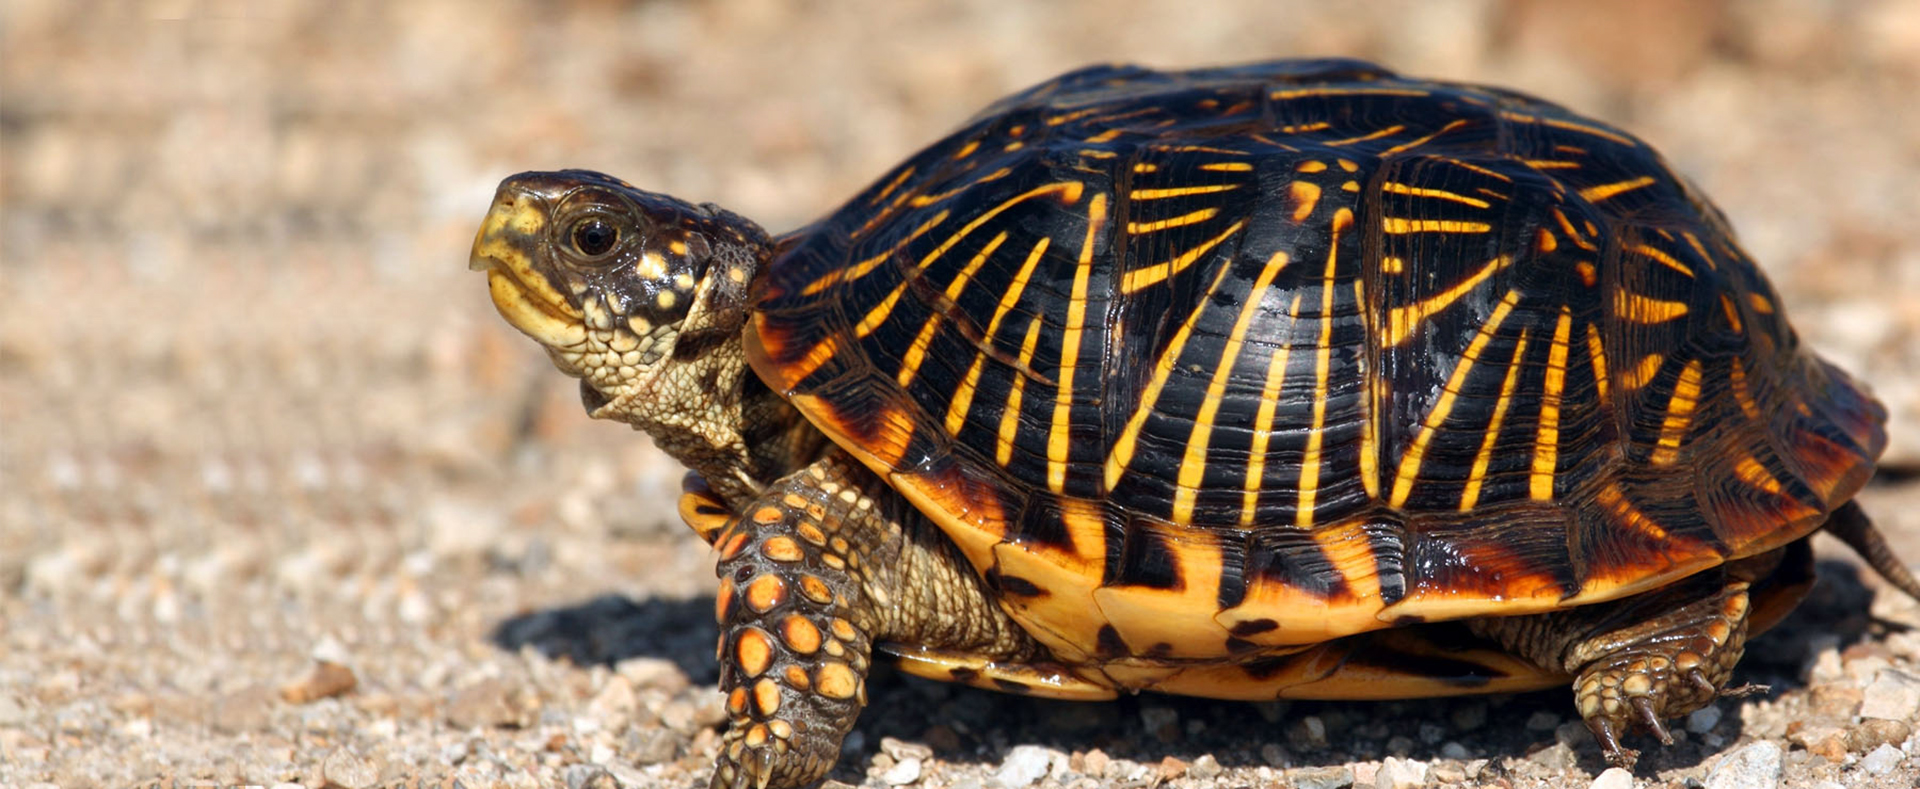 Western Box Turtle - Lehigh Valley Zoo